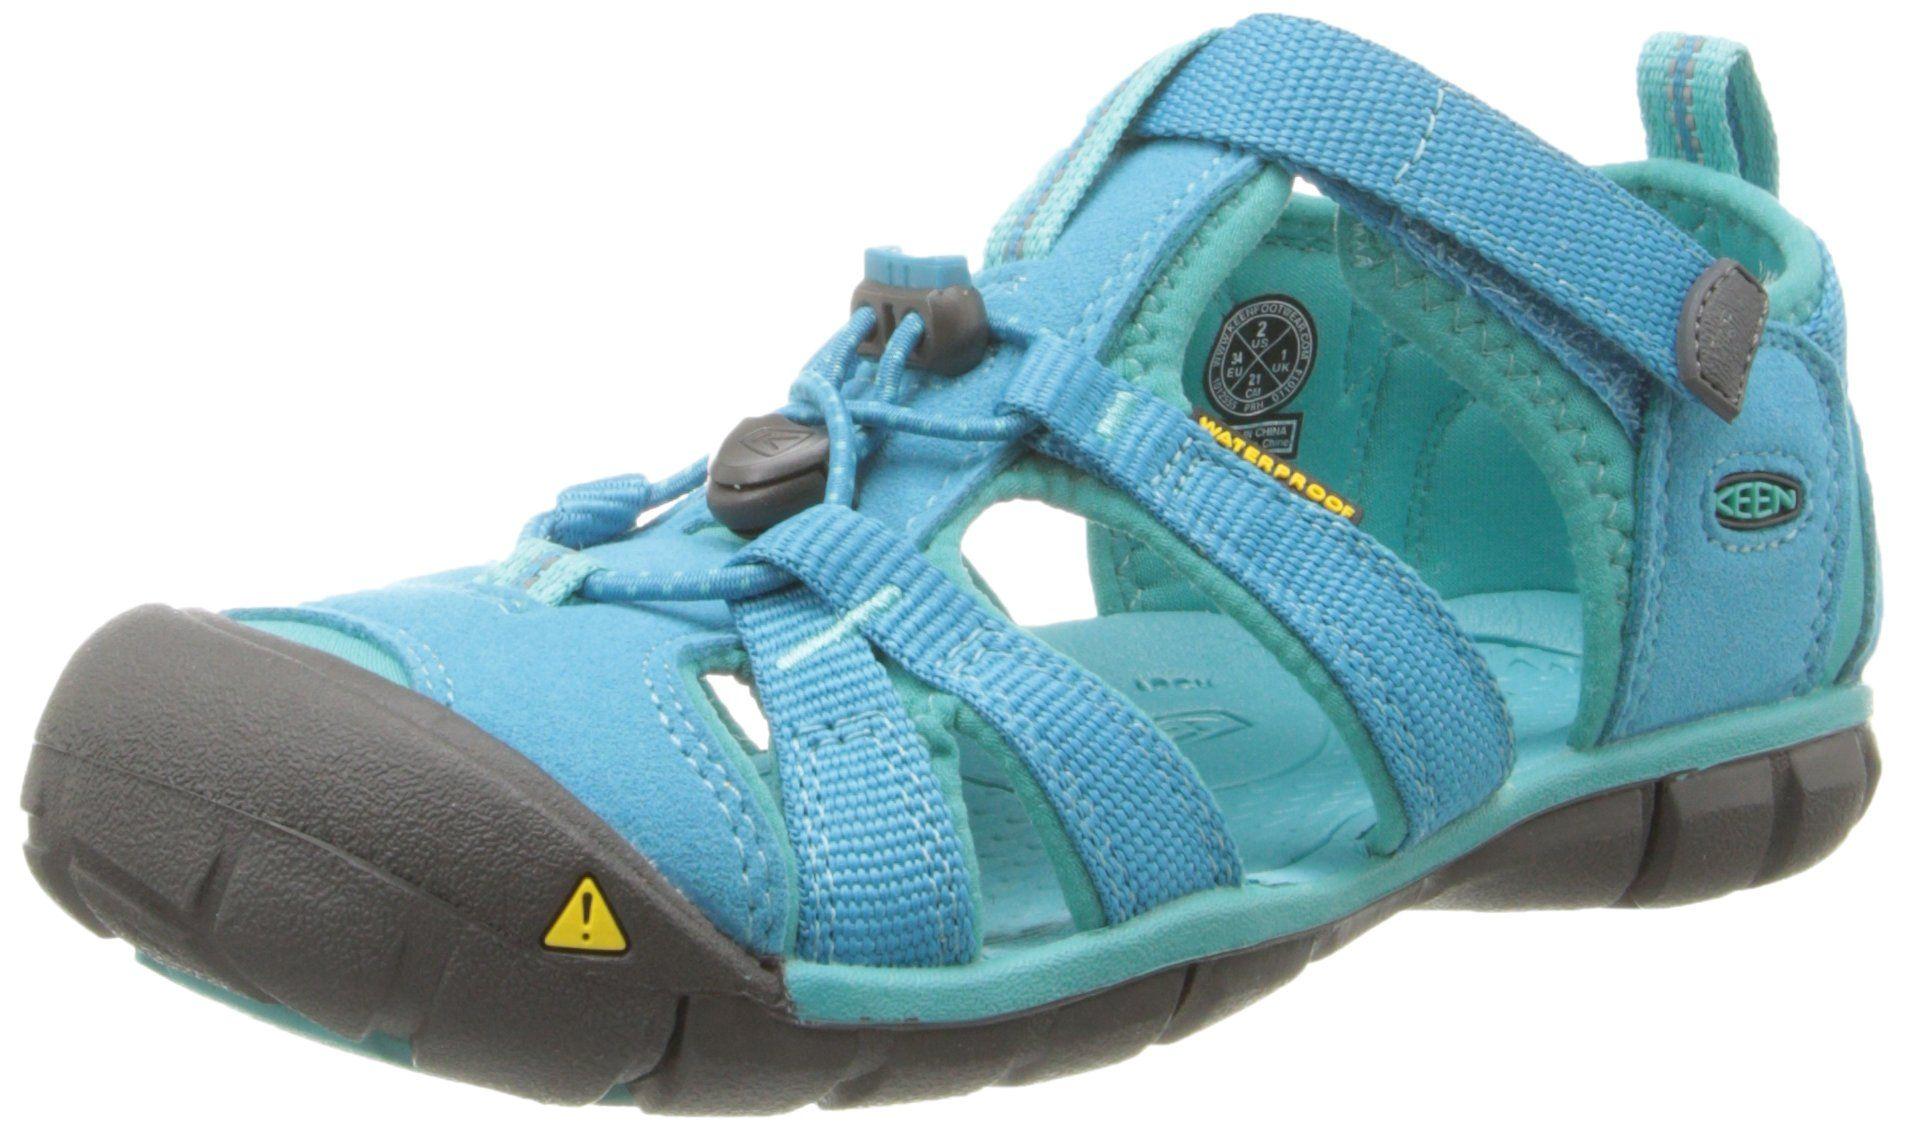 KEEN Unisex-Child Seacamp II CNX Sandals